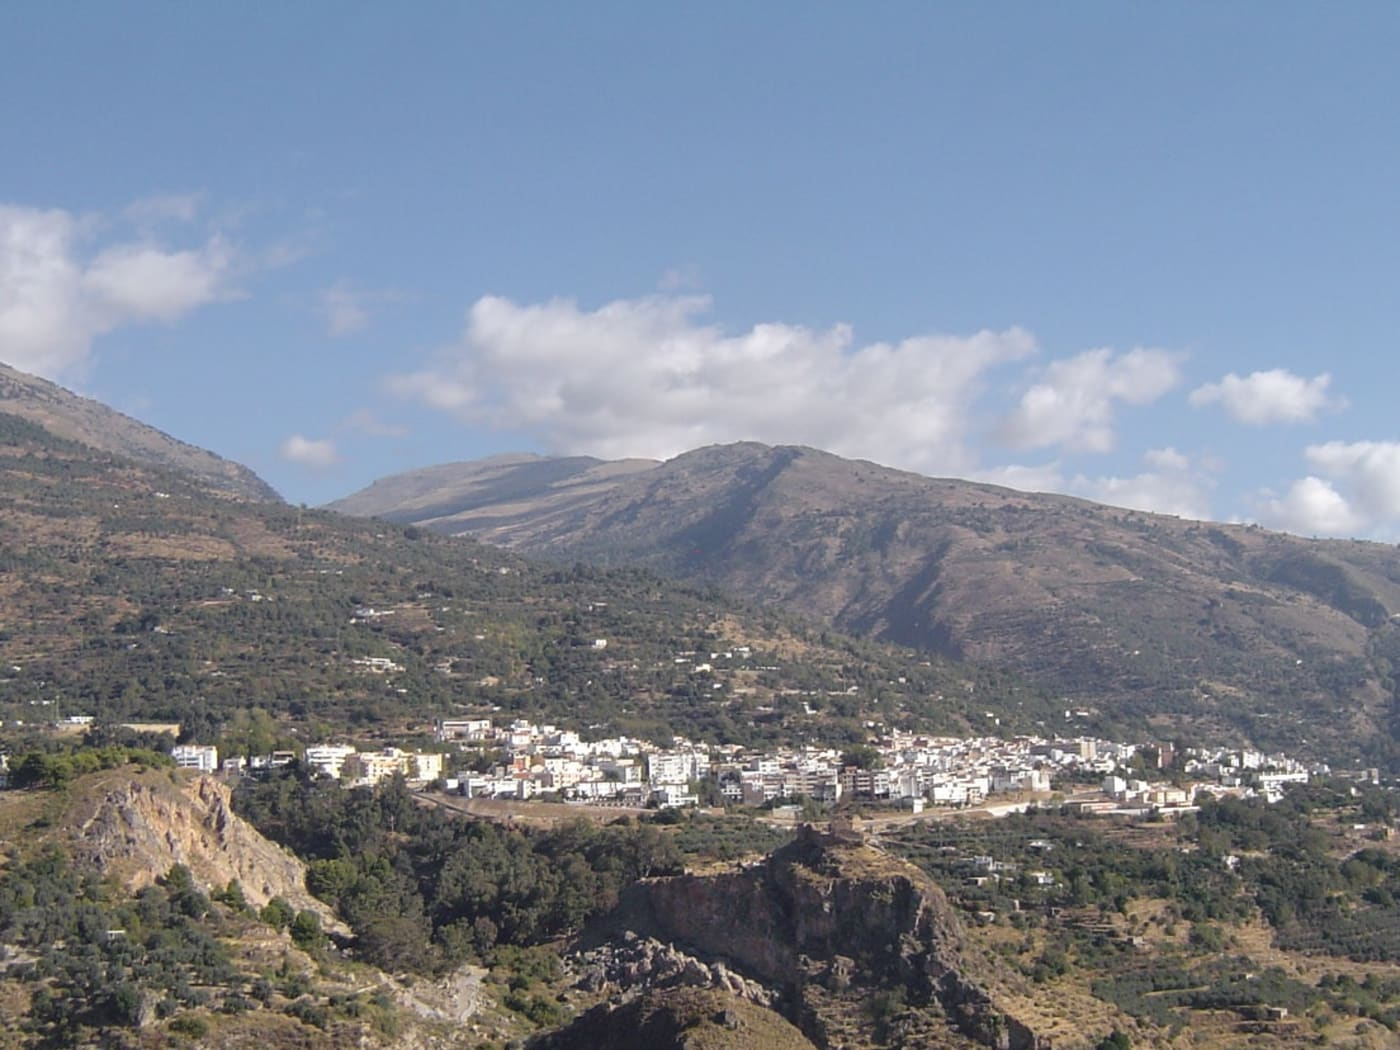 Accommodation in Lanjaron in the Alpujarras